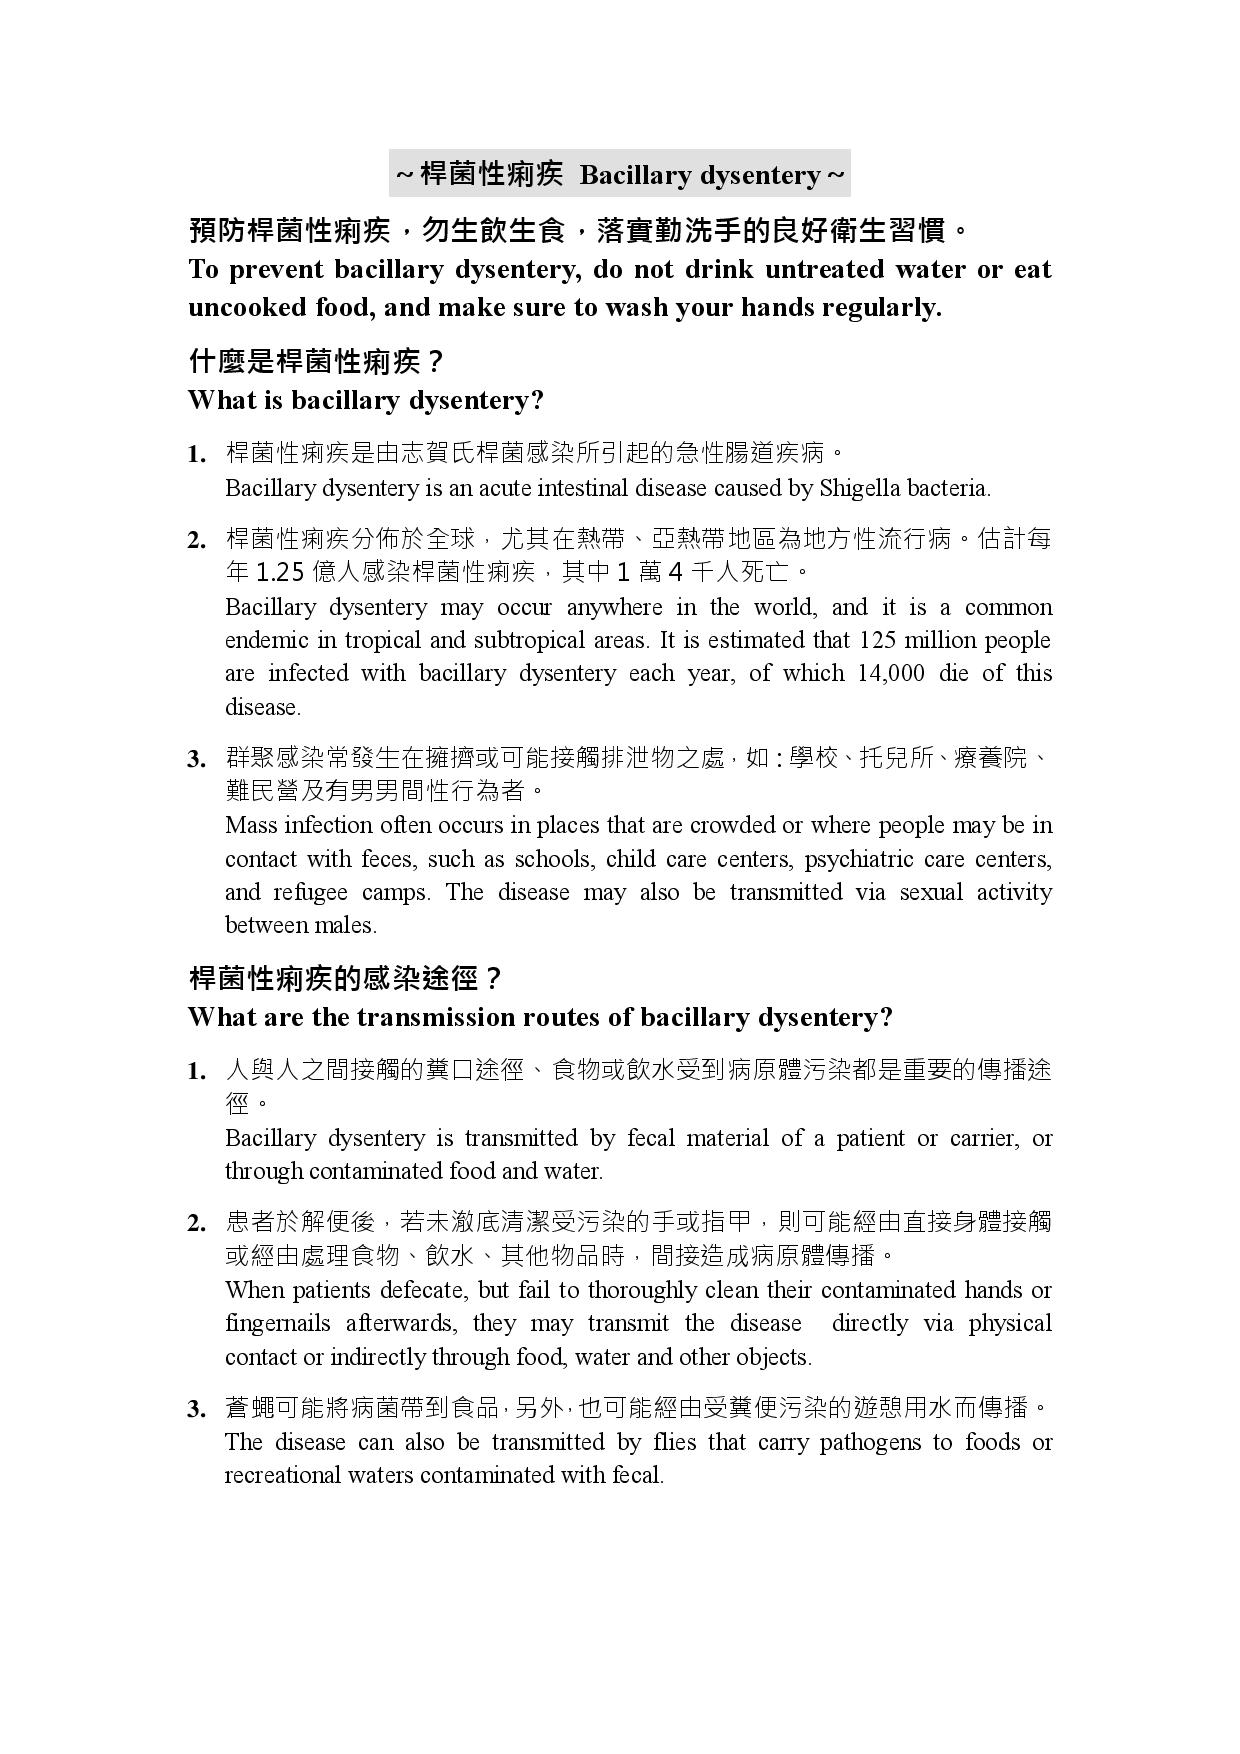 詳如附件【click me】To prevent bacillary dysentery(Page 1)預防桿菌性痢疾(英文)